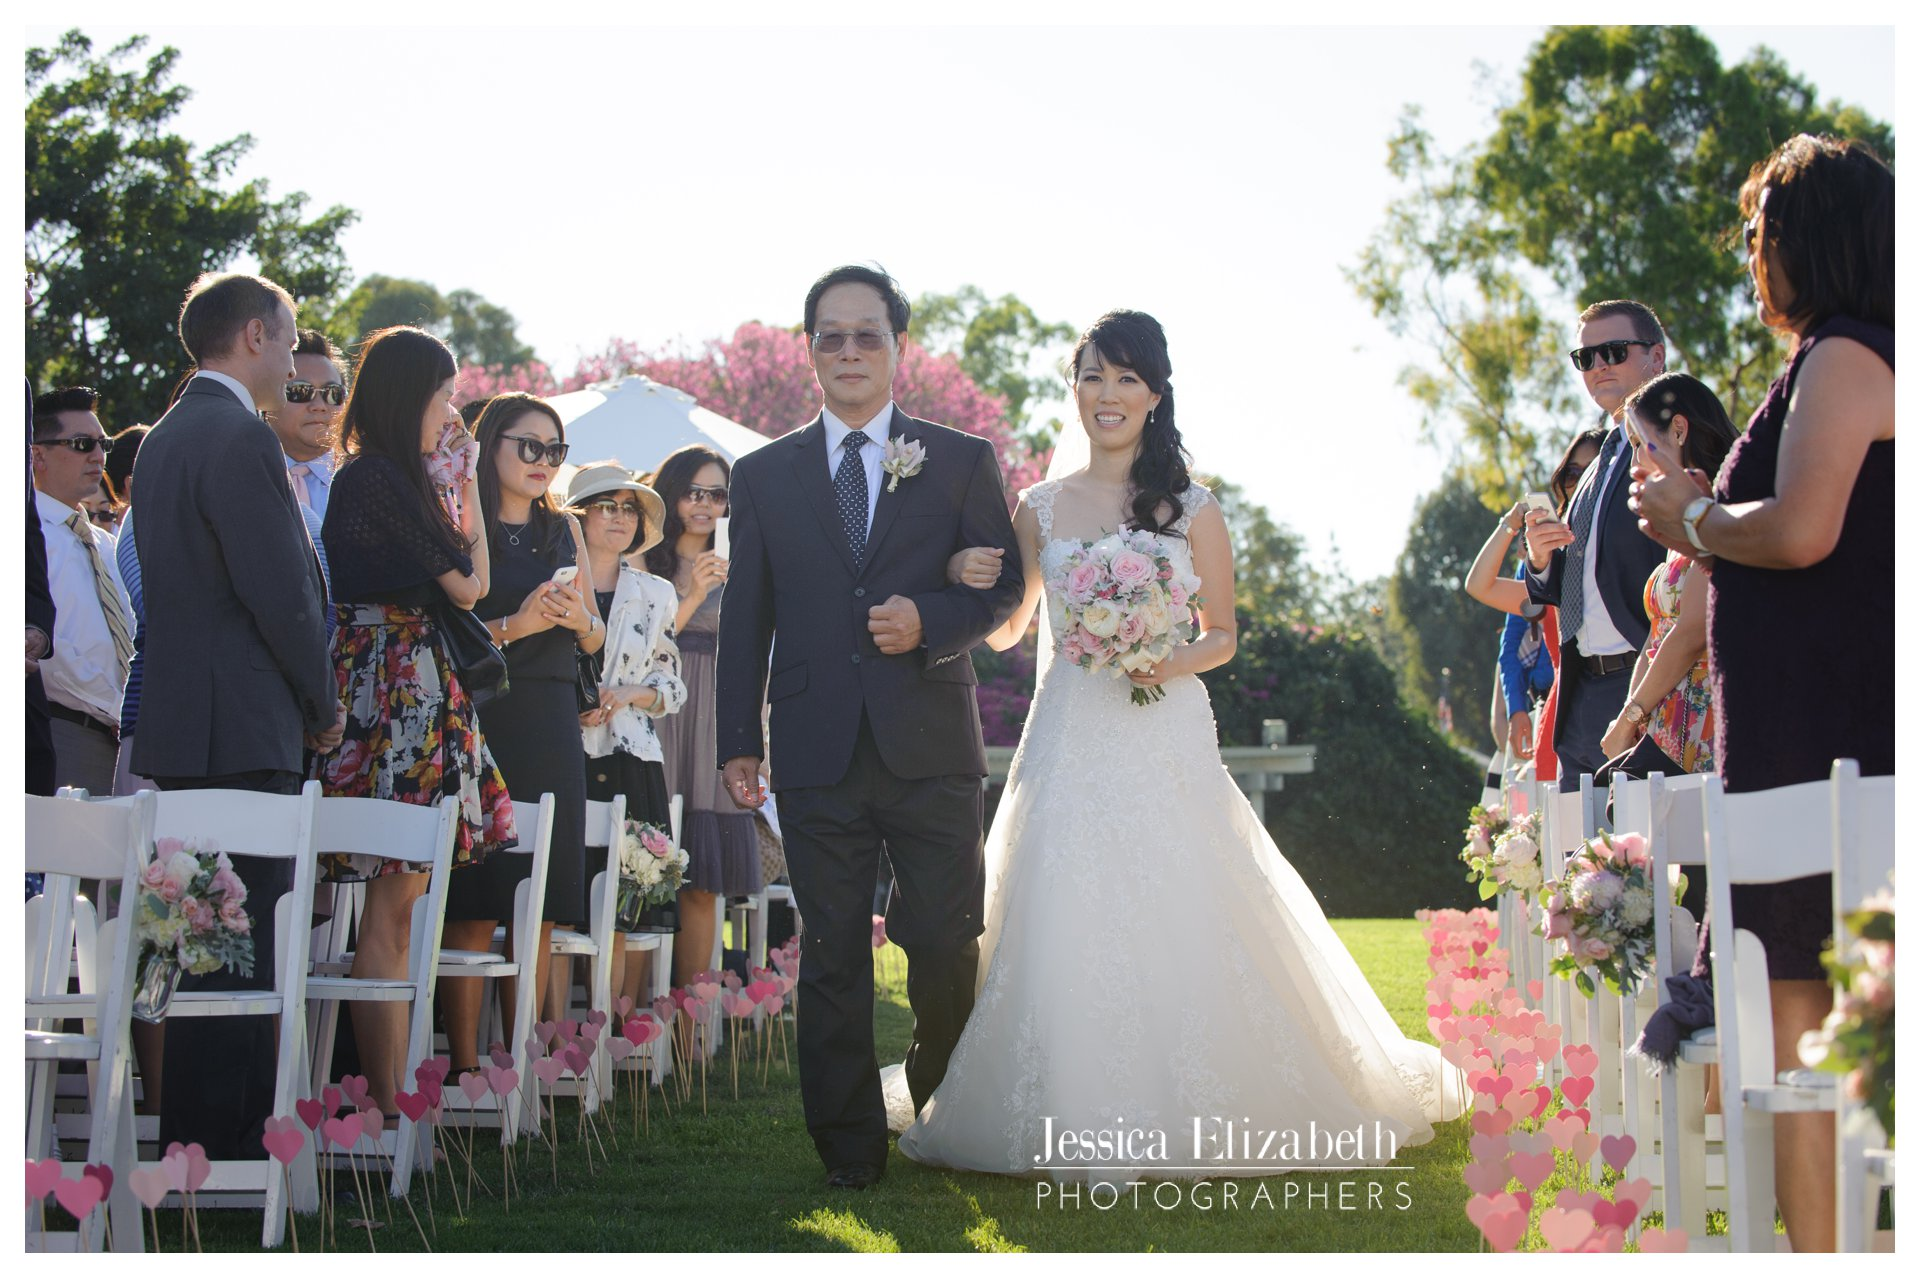 17-South Coast Botanic Garden Palos Verdes Wedding Photography by Jessica Elizabeth